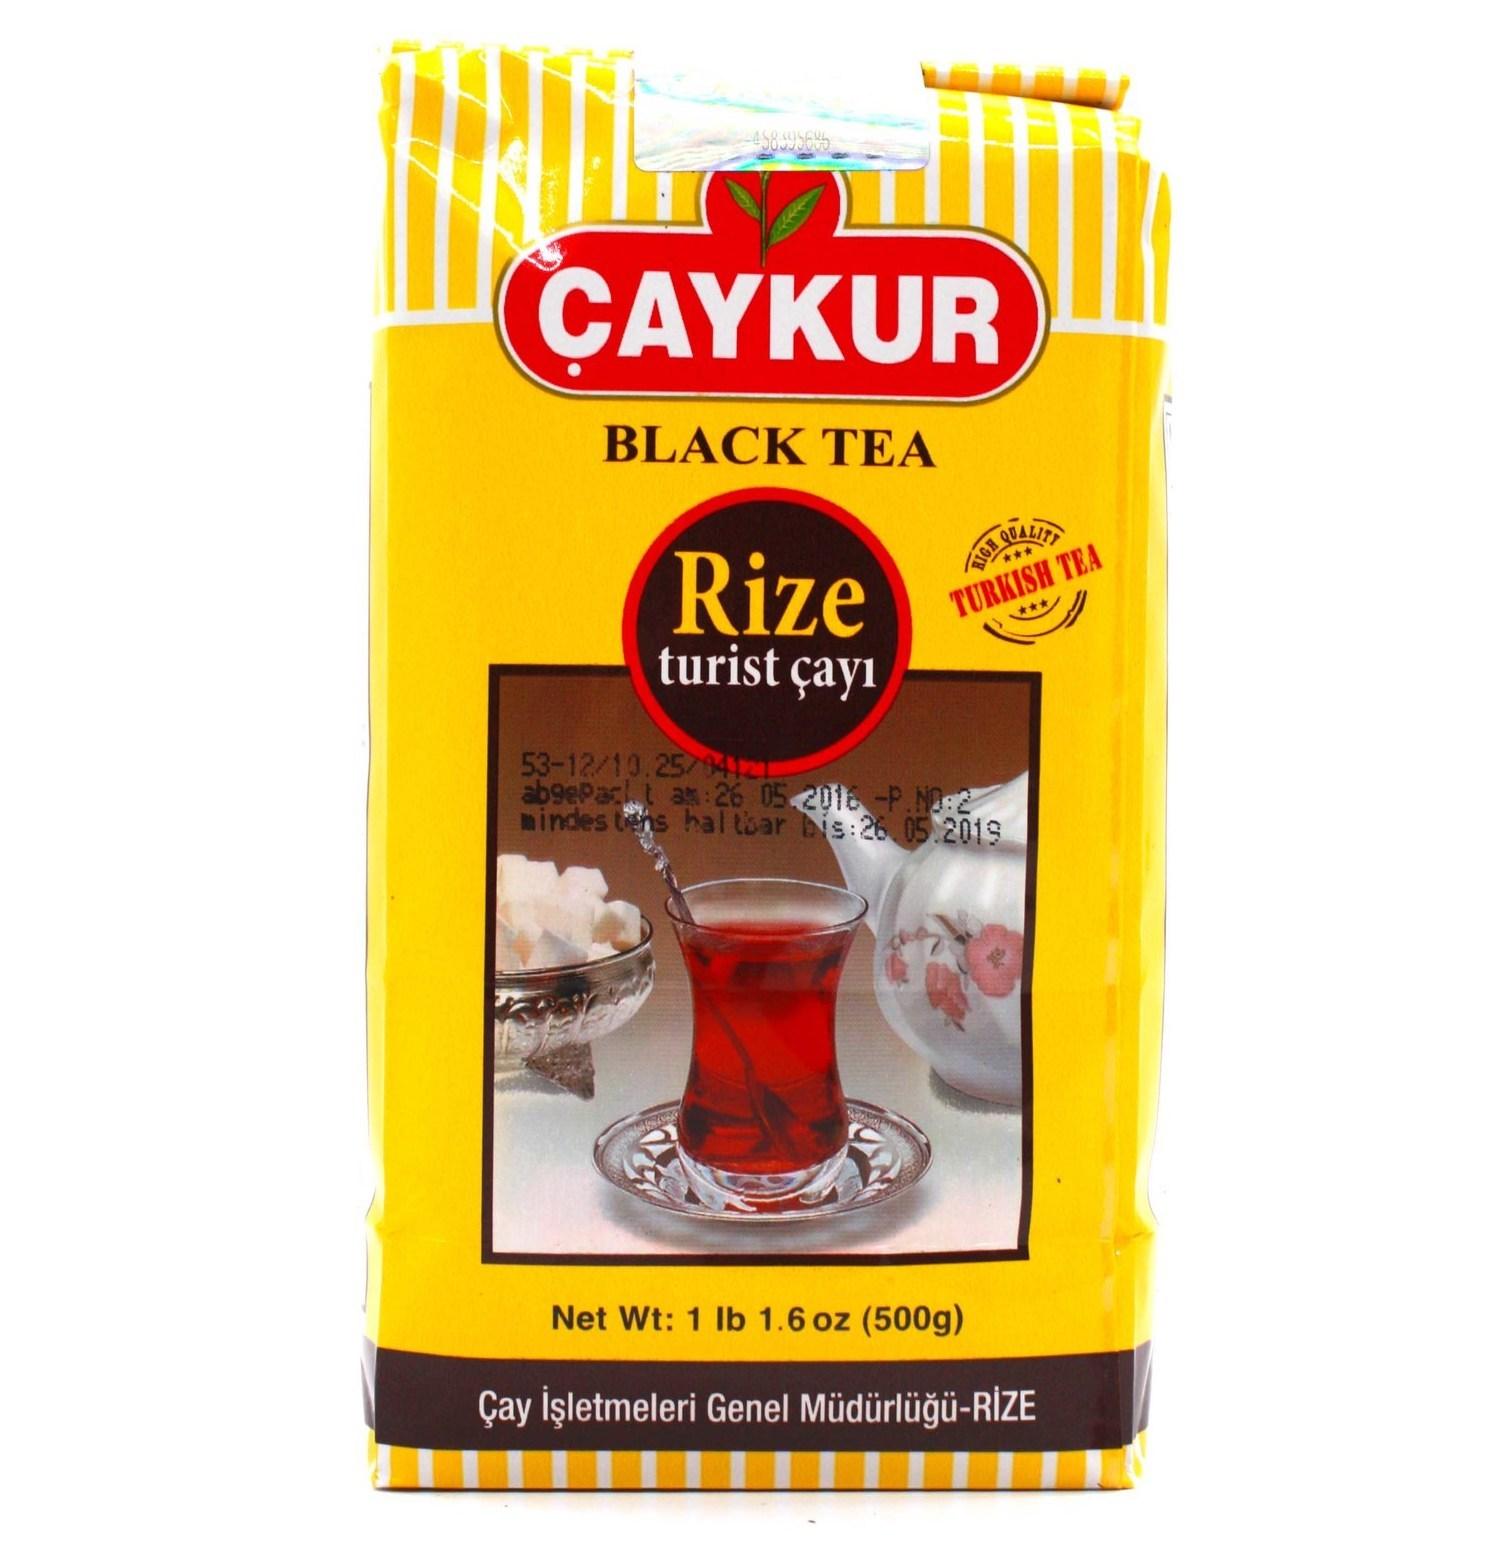 Чай Турецкий черный чай Rize Turist, Çaykur, 500 г import_files_a0_a058a49ba51711e8a99c484d7ecee297_7b9d99ba366e11e9a9a6484d7ecee297.jpg